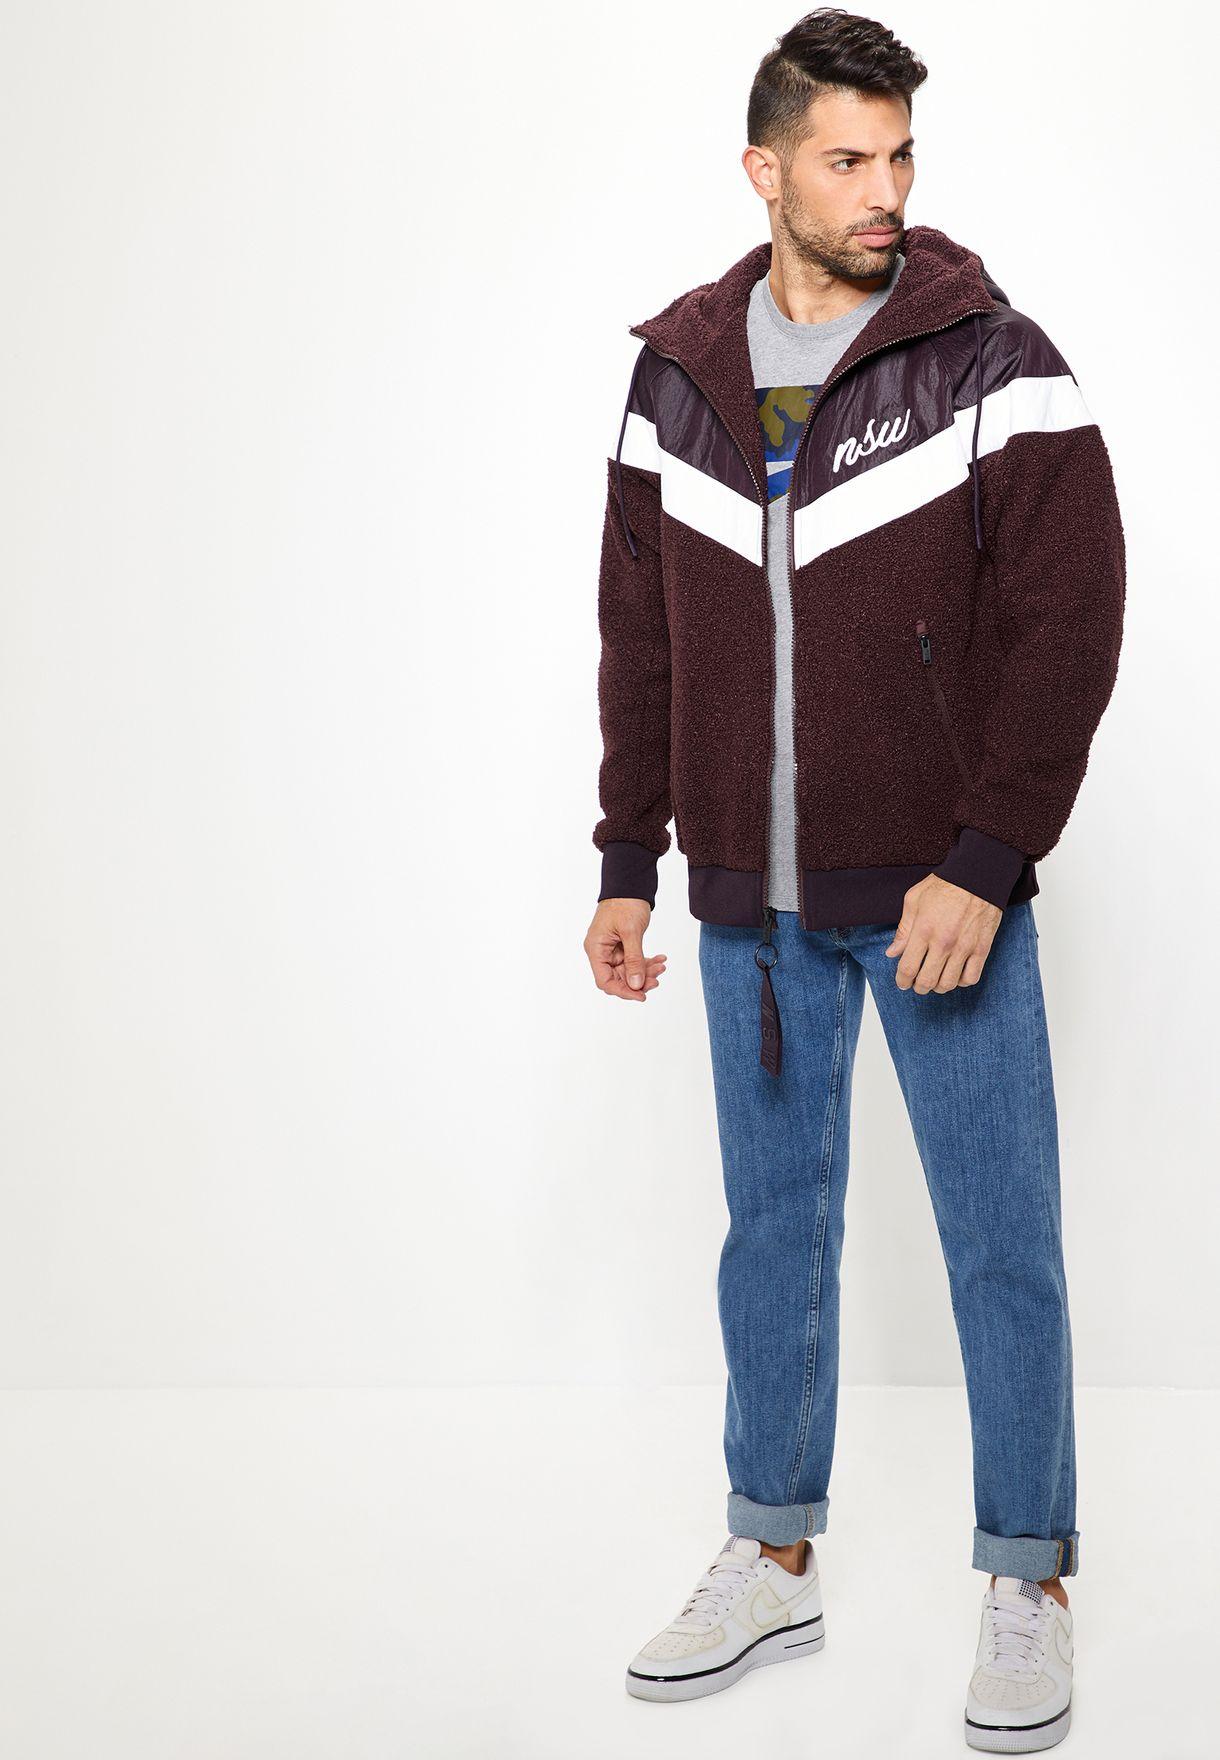 bambino vendita all'ingrosso stile popolare Shop Nike burgundy NSW Sherpa Windrunner 930316-659 for Men in ...